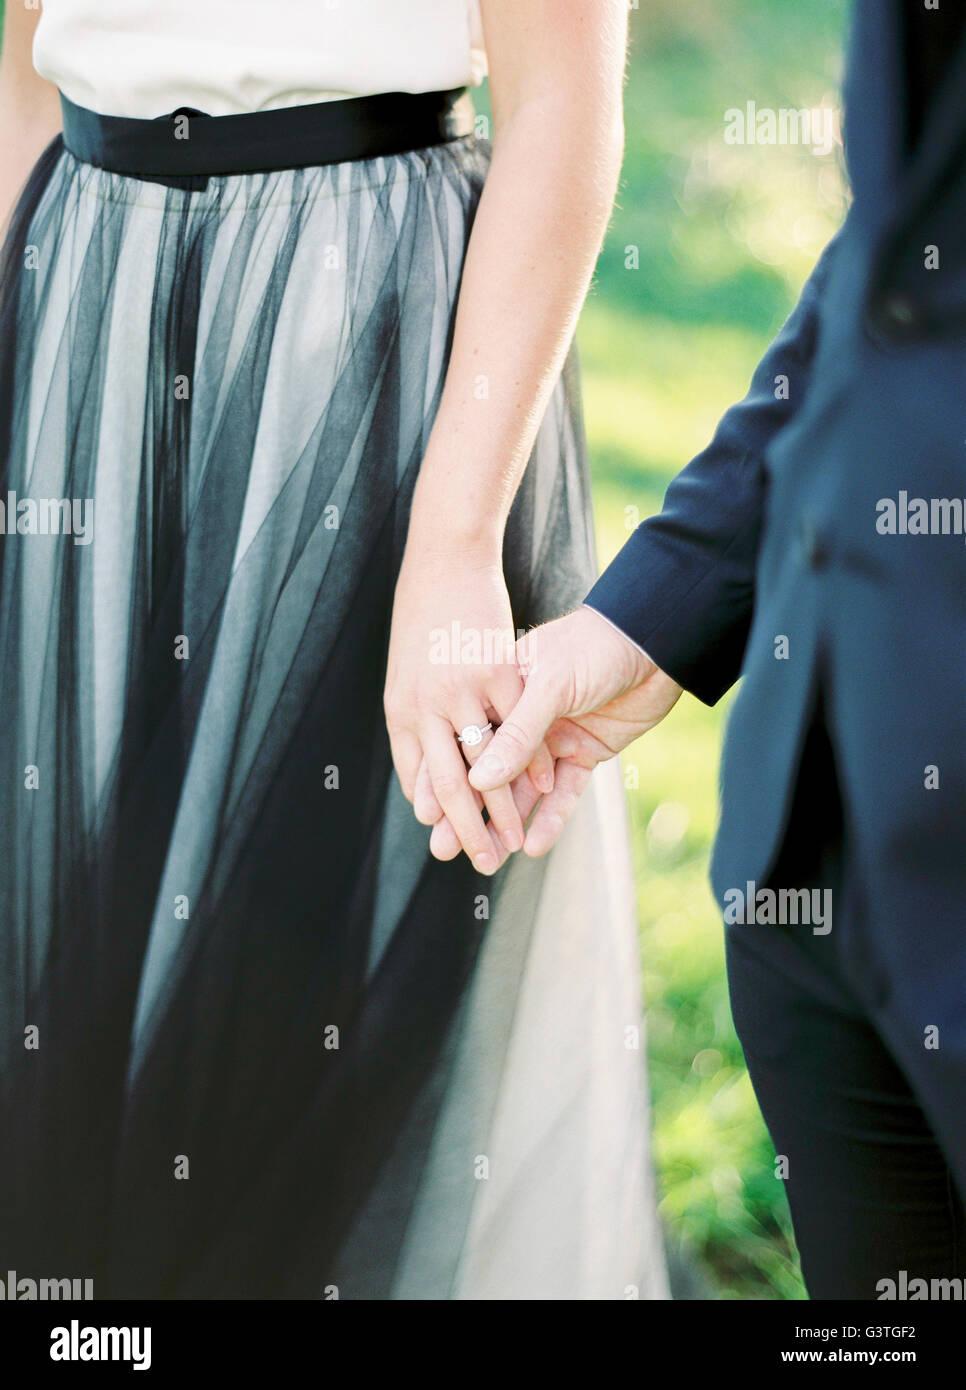 Sweden, Bride and groom holding hands - Stock Image